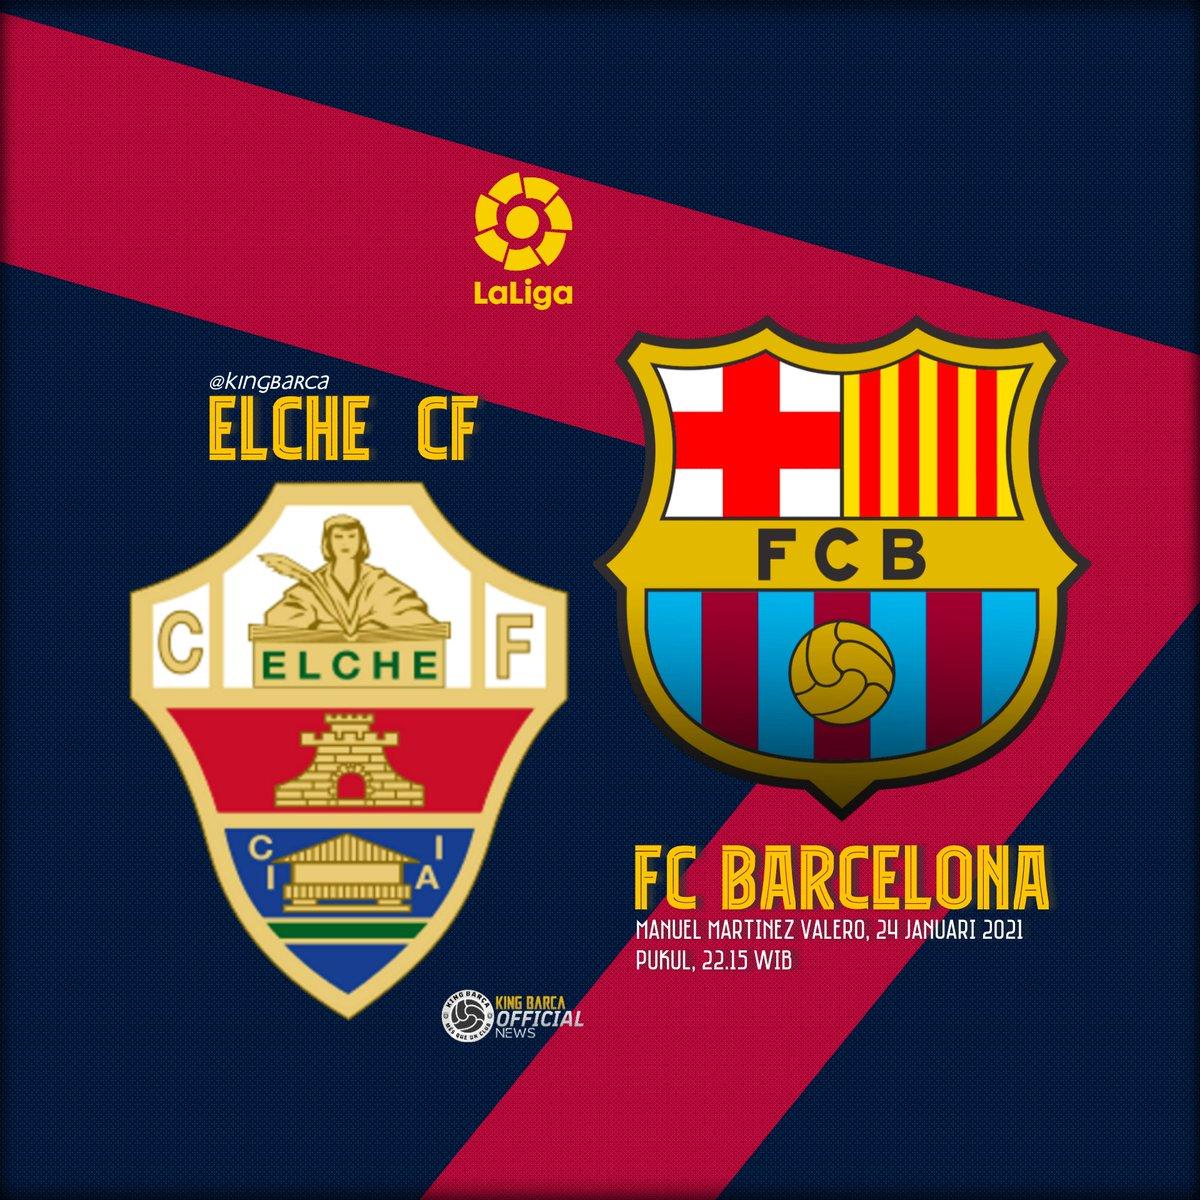 #NextMatch!!  🚩 #LaLiga Jornada 20 ⚽ Elche vs Barcelona 📅 Minggu, 24 Januari 2021 🕙 22:15 WIB 🏟 Martinez Valero 📺 BeIN Sport 1 / Streaming  #ForcaBarca #KingBarca